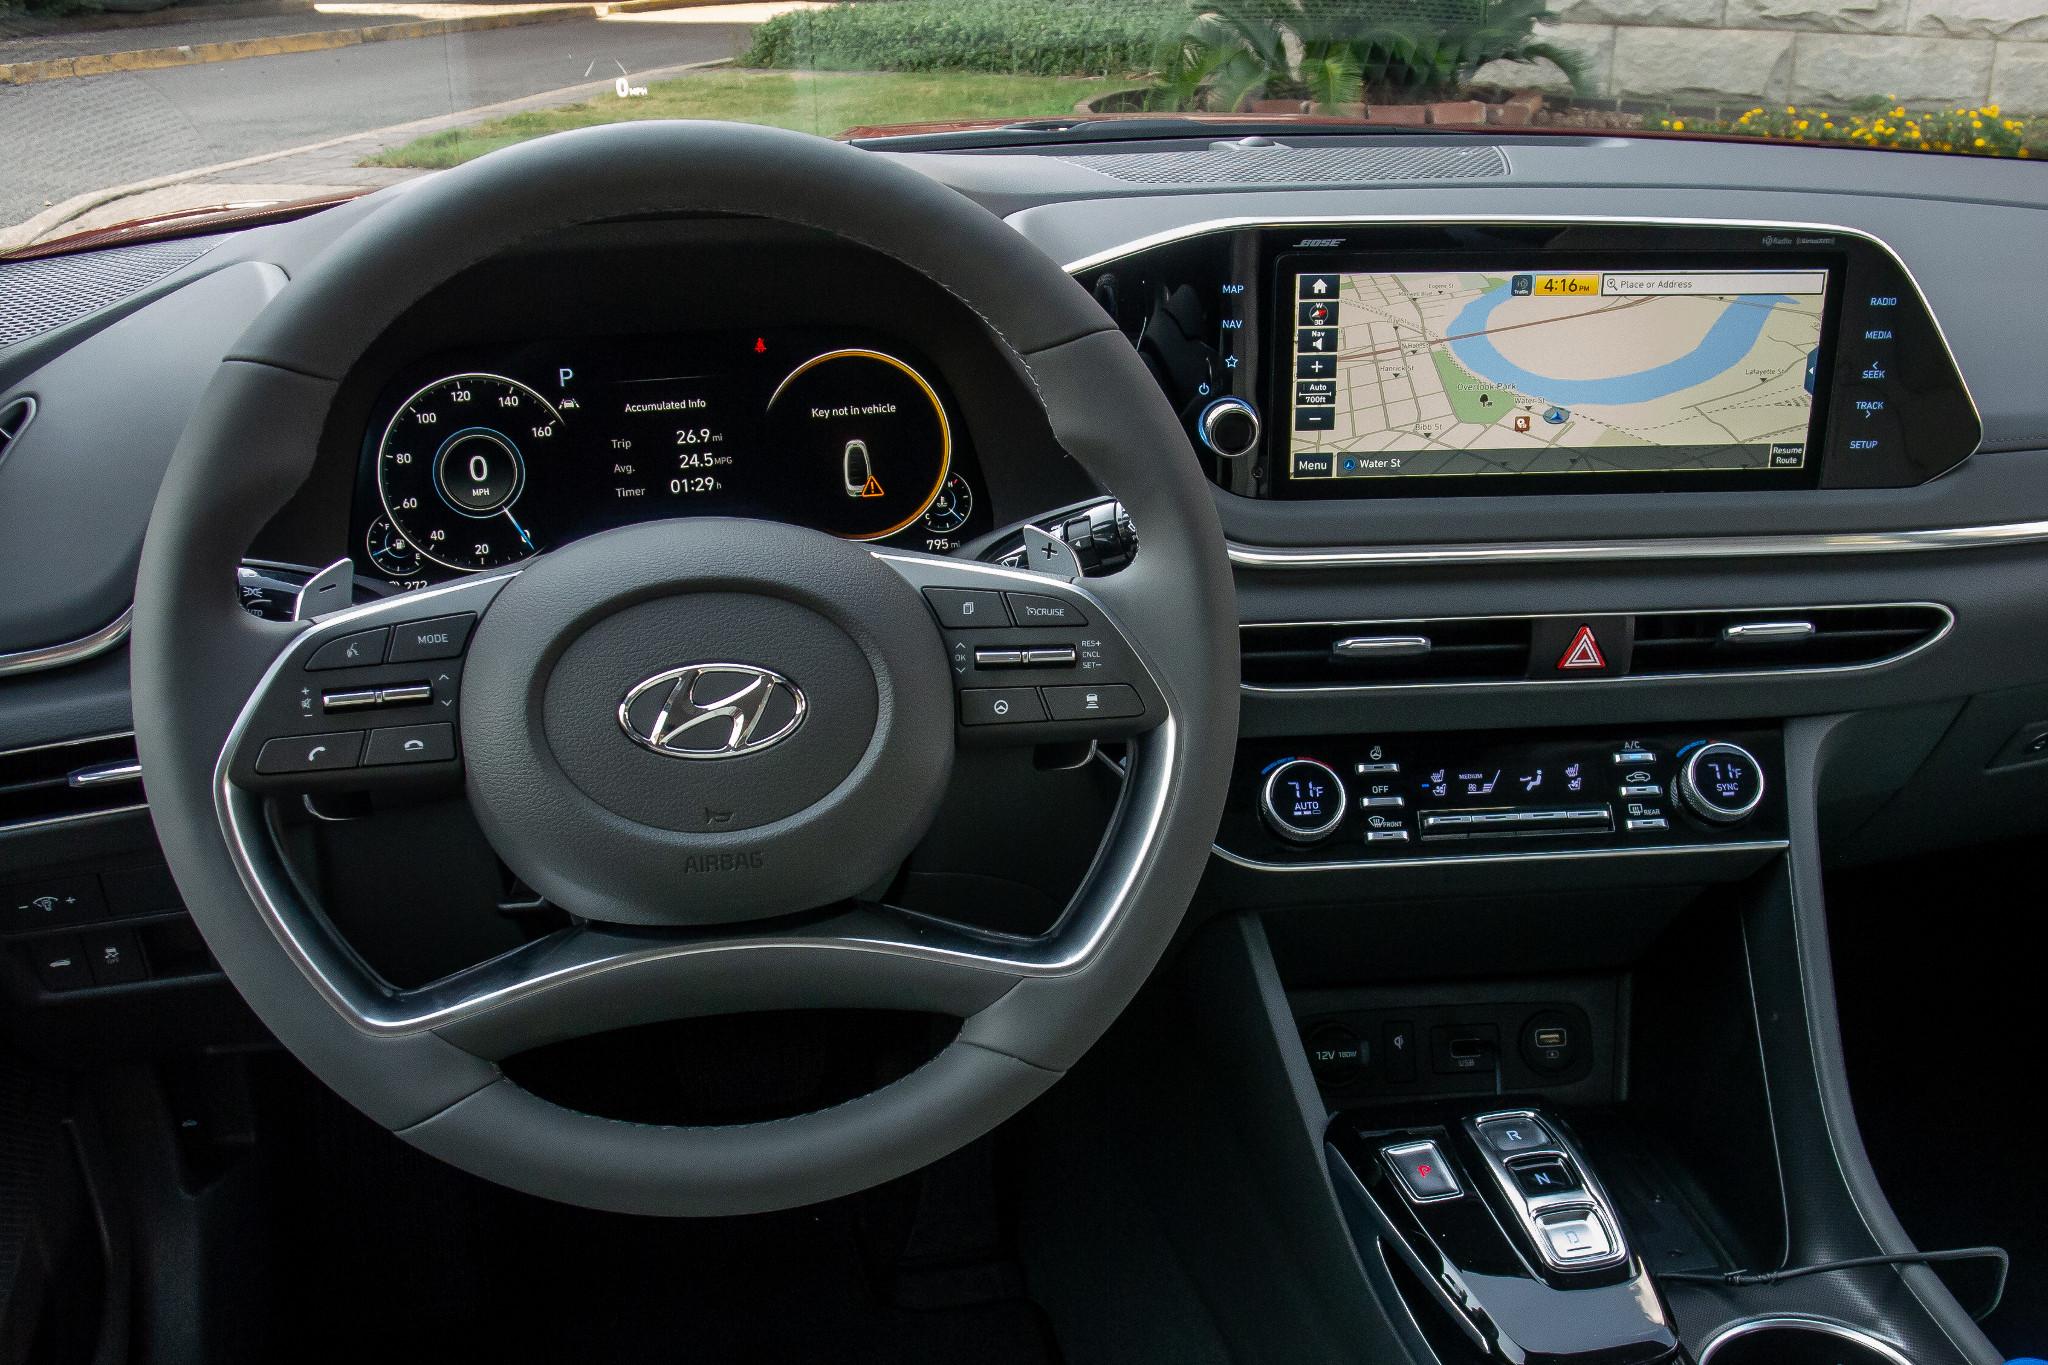 hyundai-sonata-2020-front-row--interior--steering-wheel-11.jpg